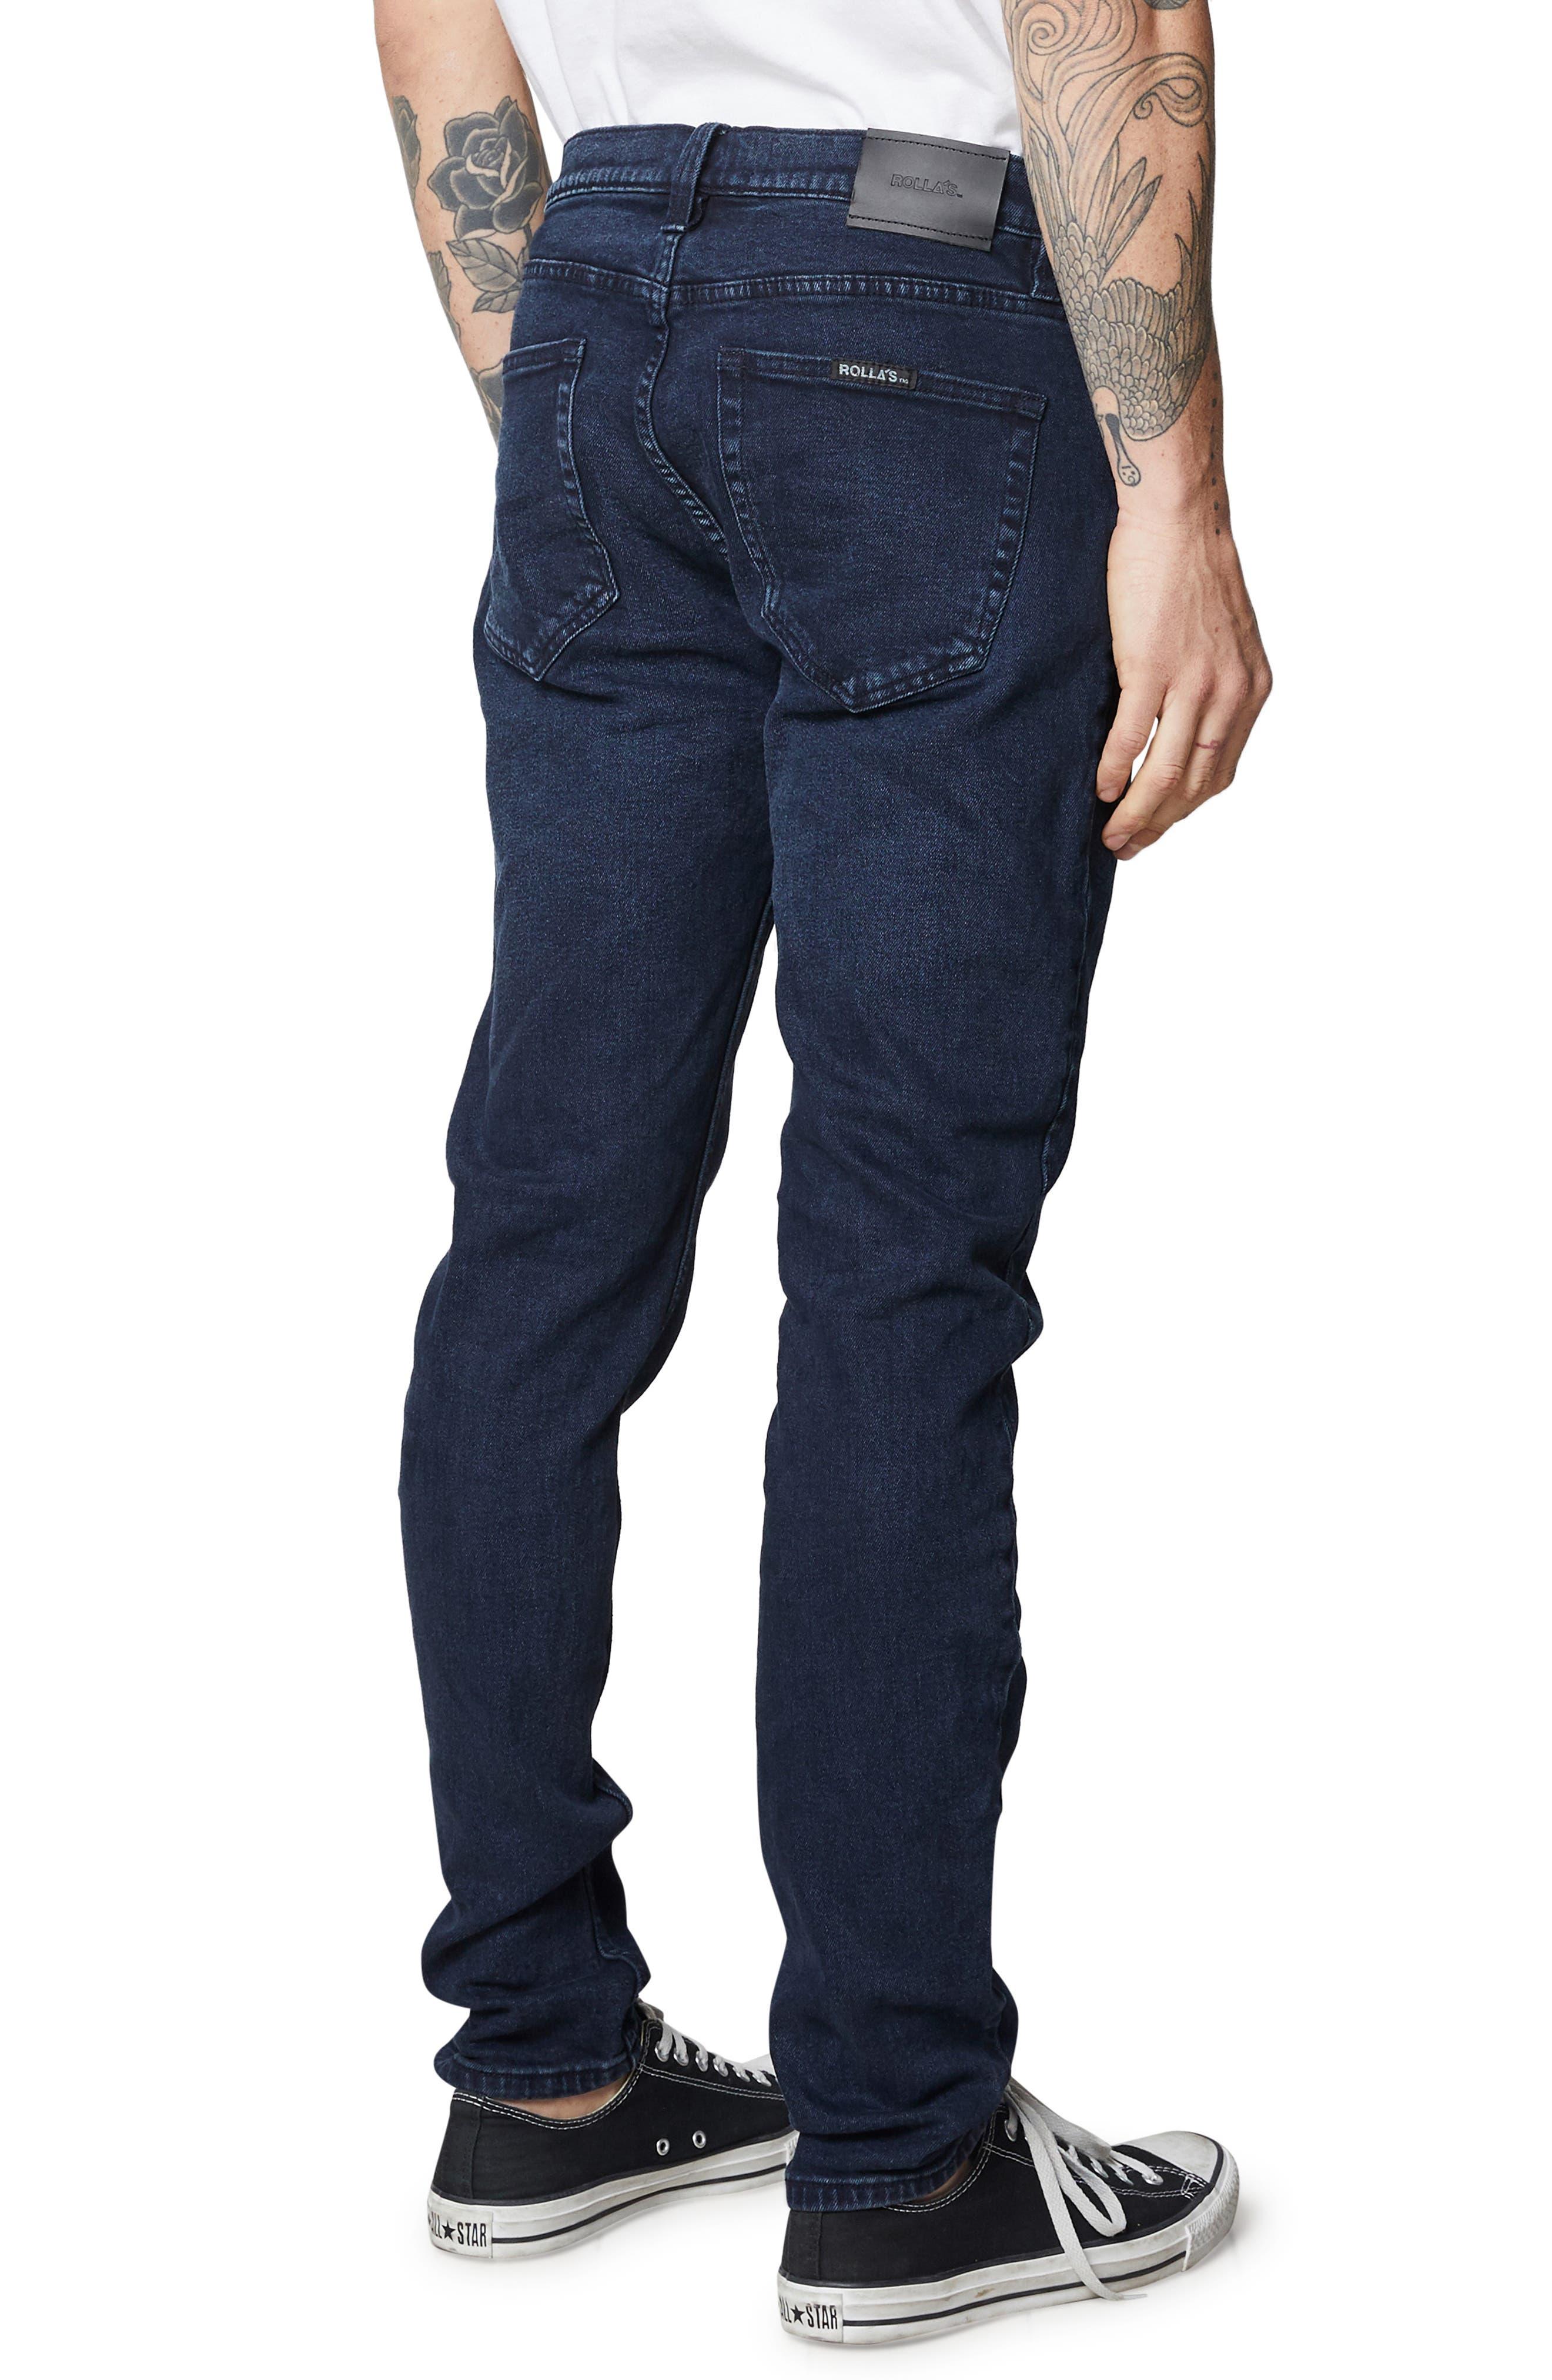 Stinger Skinny Fit Jeans,                             Alternate thumbnail 4, color,                             STONE FREE BLACK